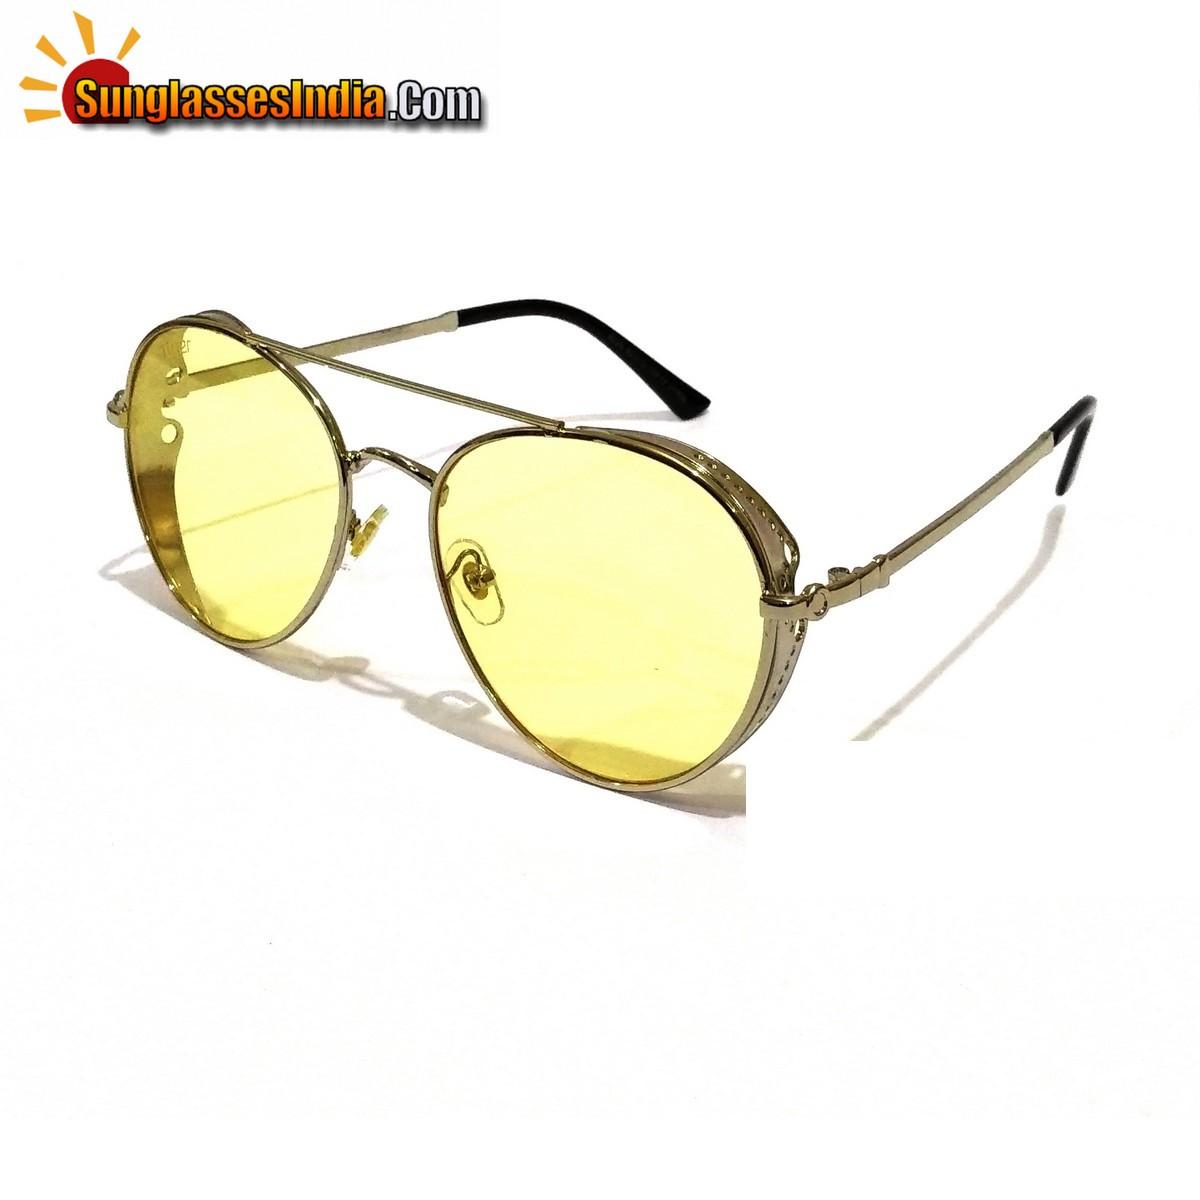 Round Trendy Club Sunglasses Night Driving Sunglasses Tik Tok Video Goggles Sunglasses